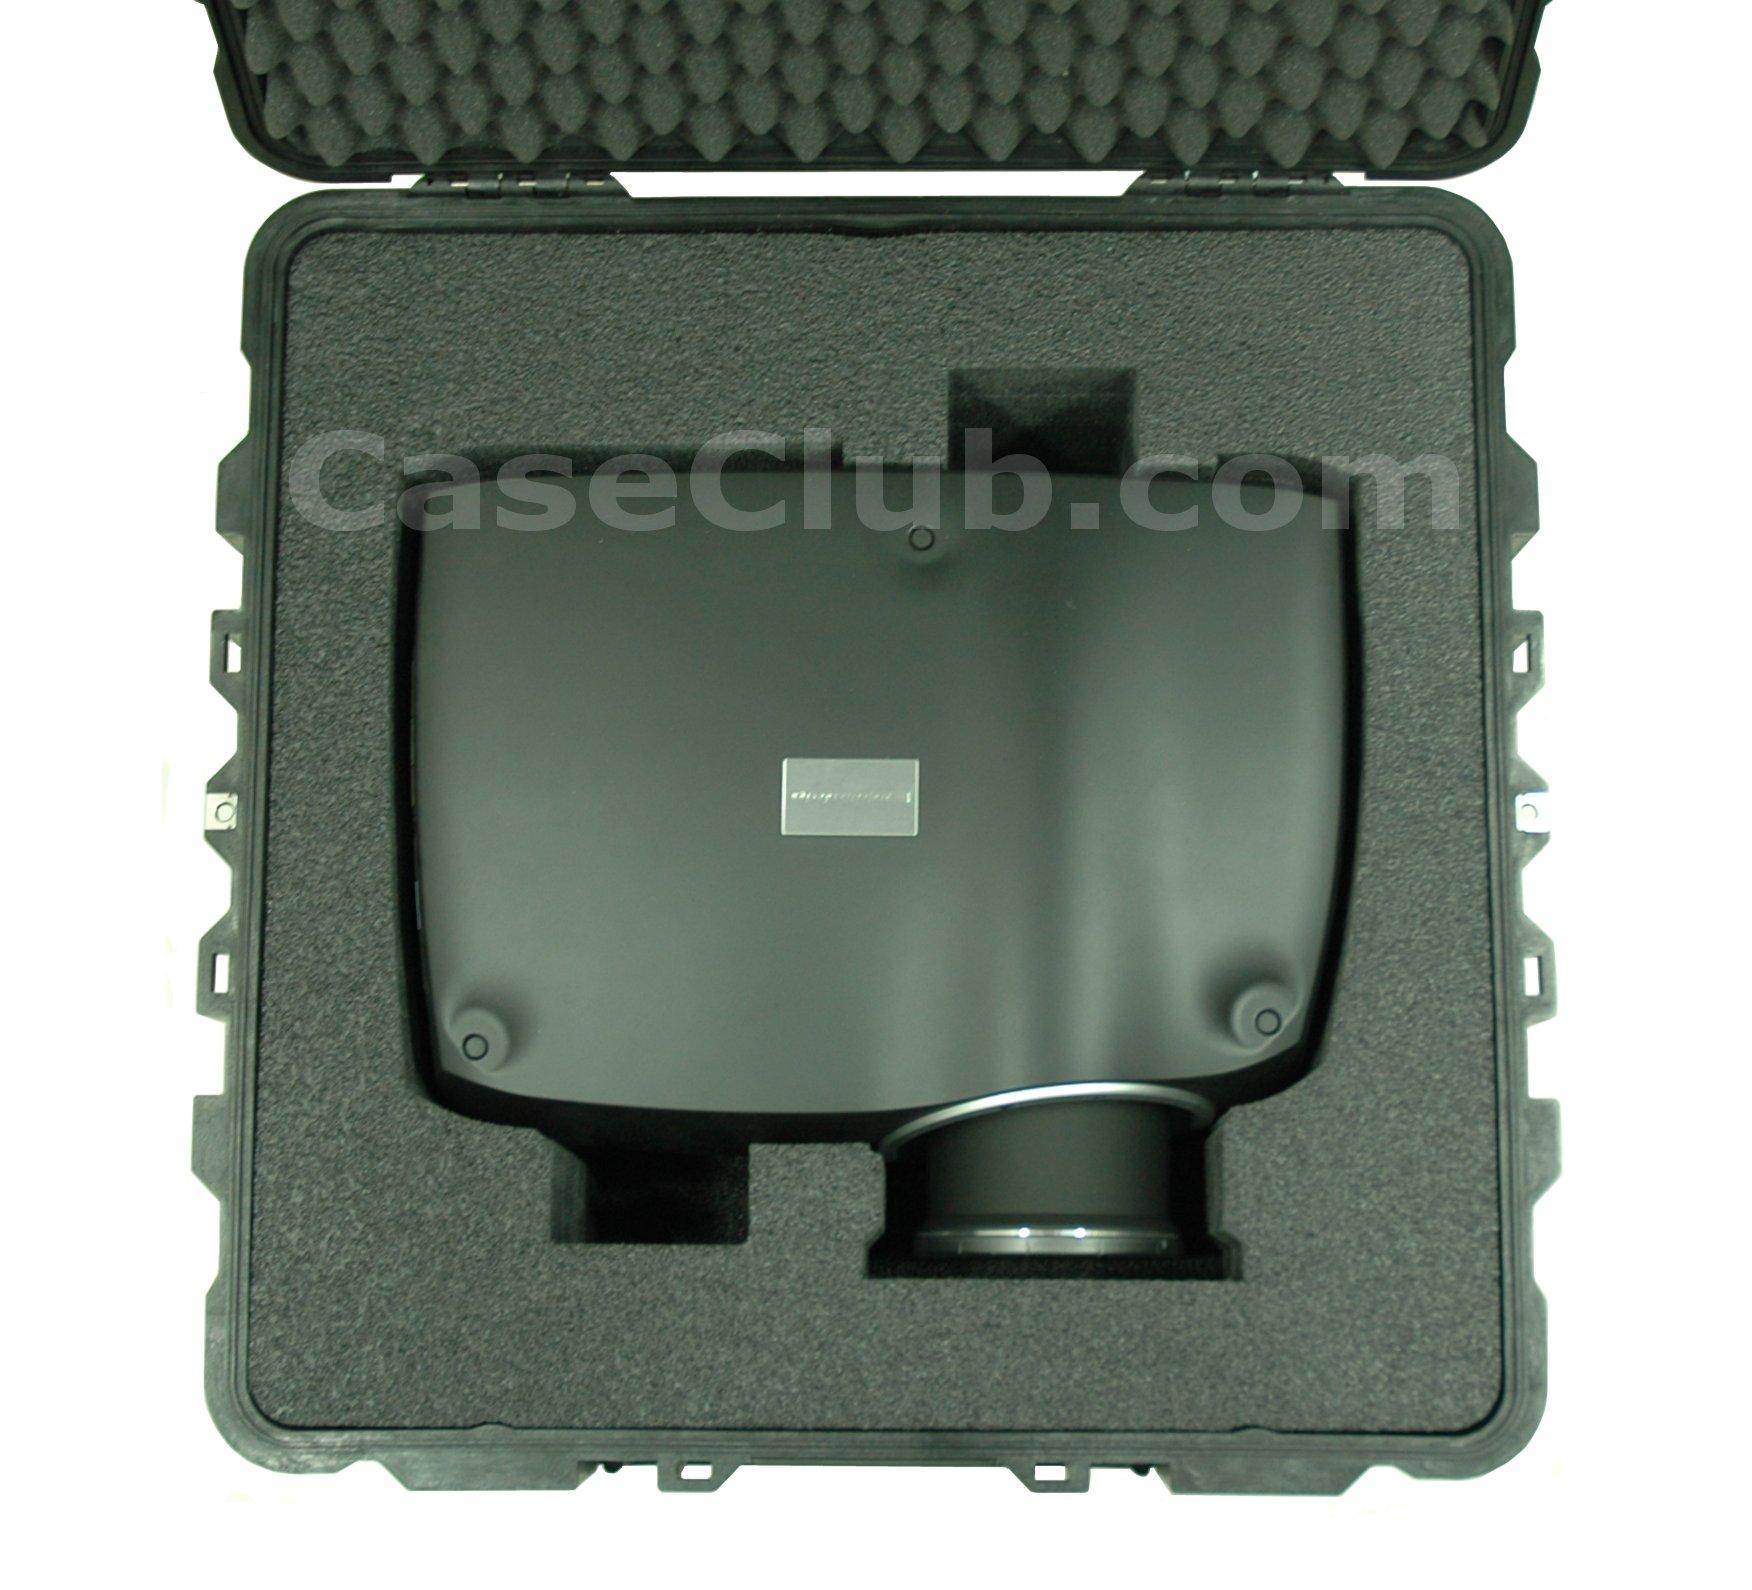 Pelican™ 1640 Case Custom Foam Example: Barco F32 Series Projector Case